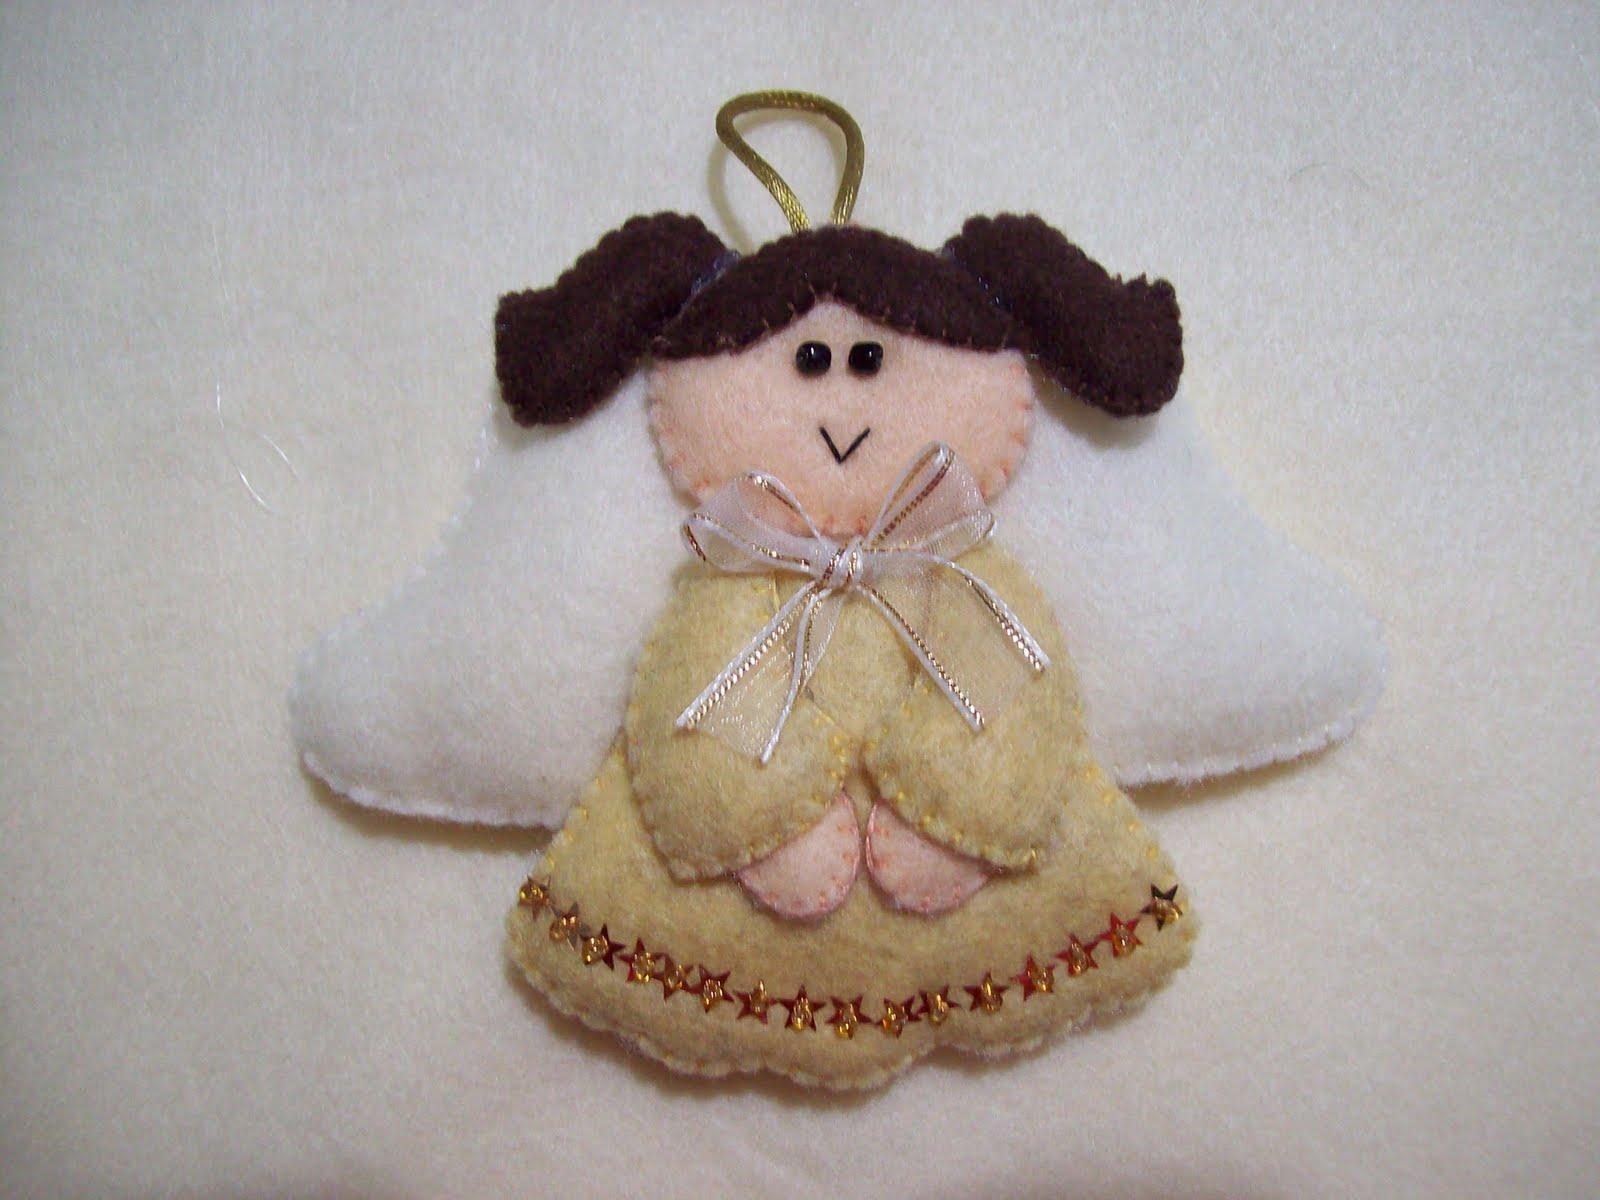 Shexeldetallitos blog de manualidades adornos de angelitos de fieltro para arbol de navidad - Manualidades en fieltro para navidad ...